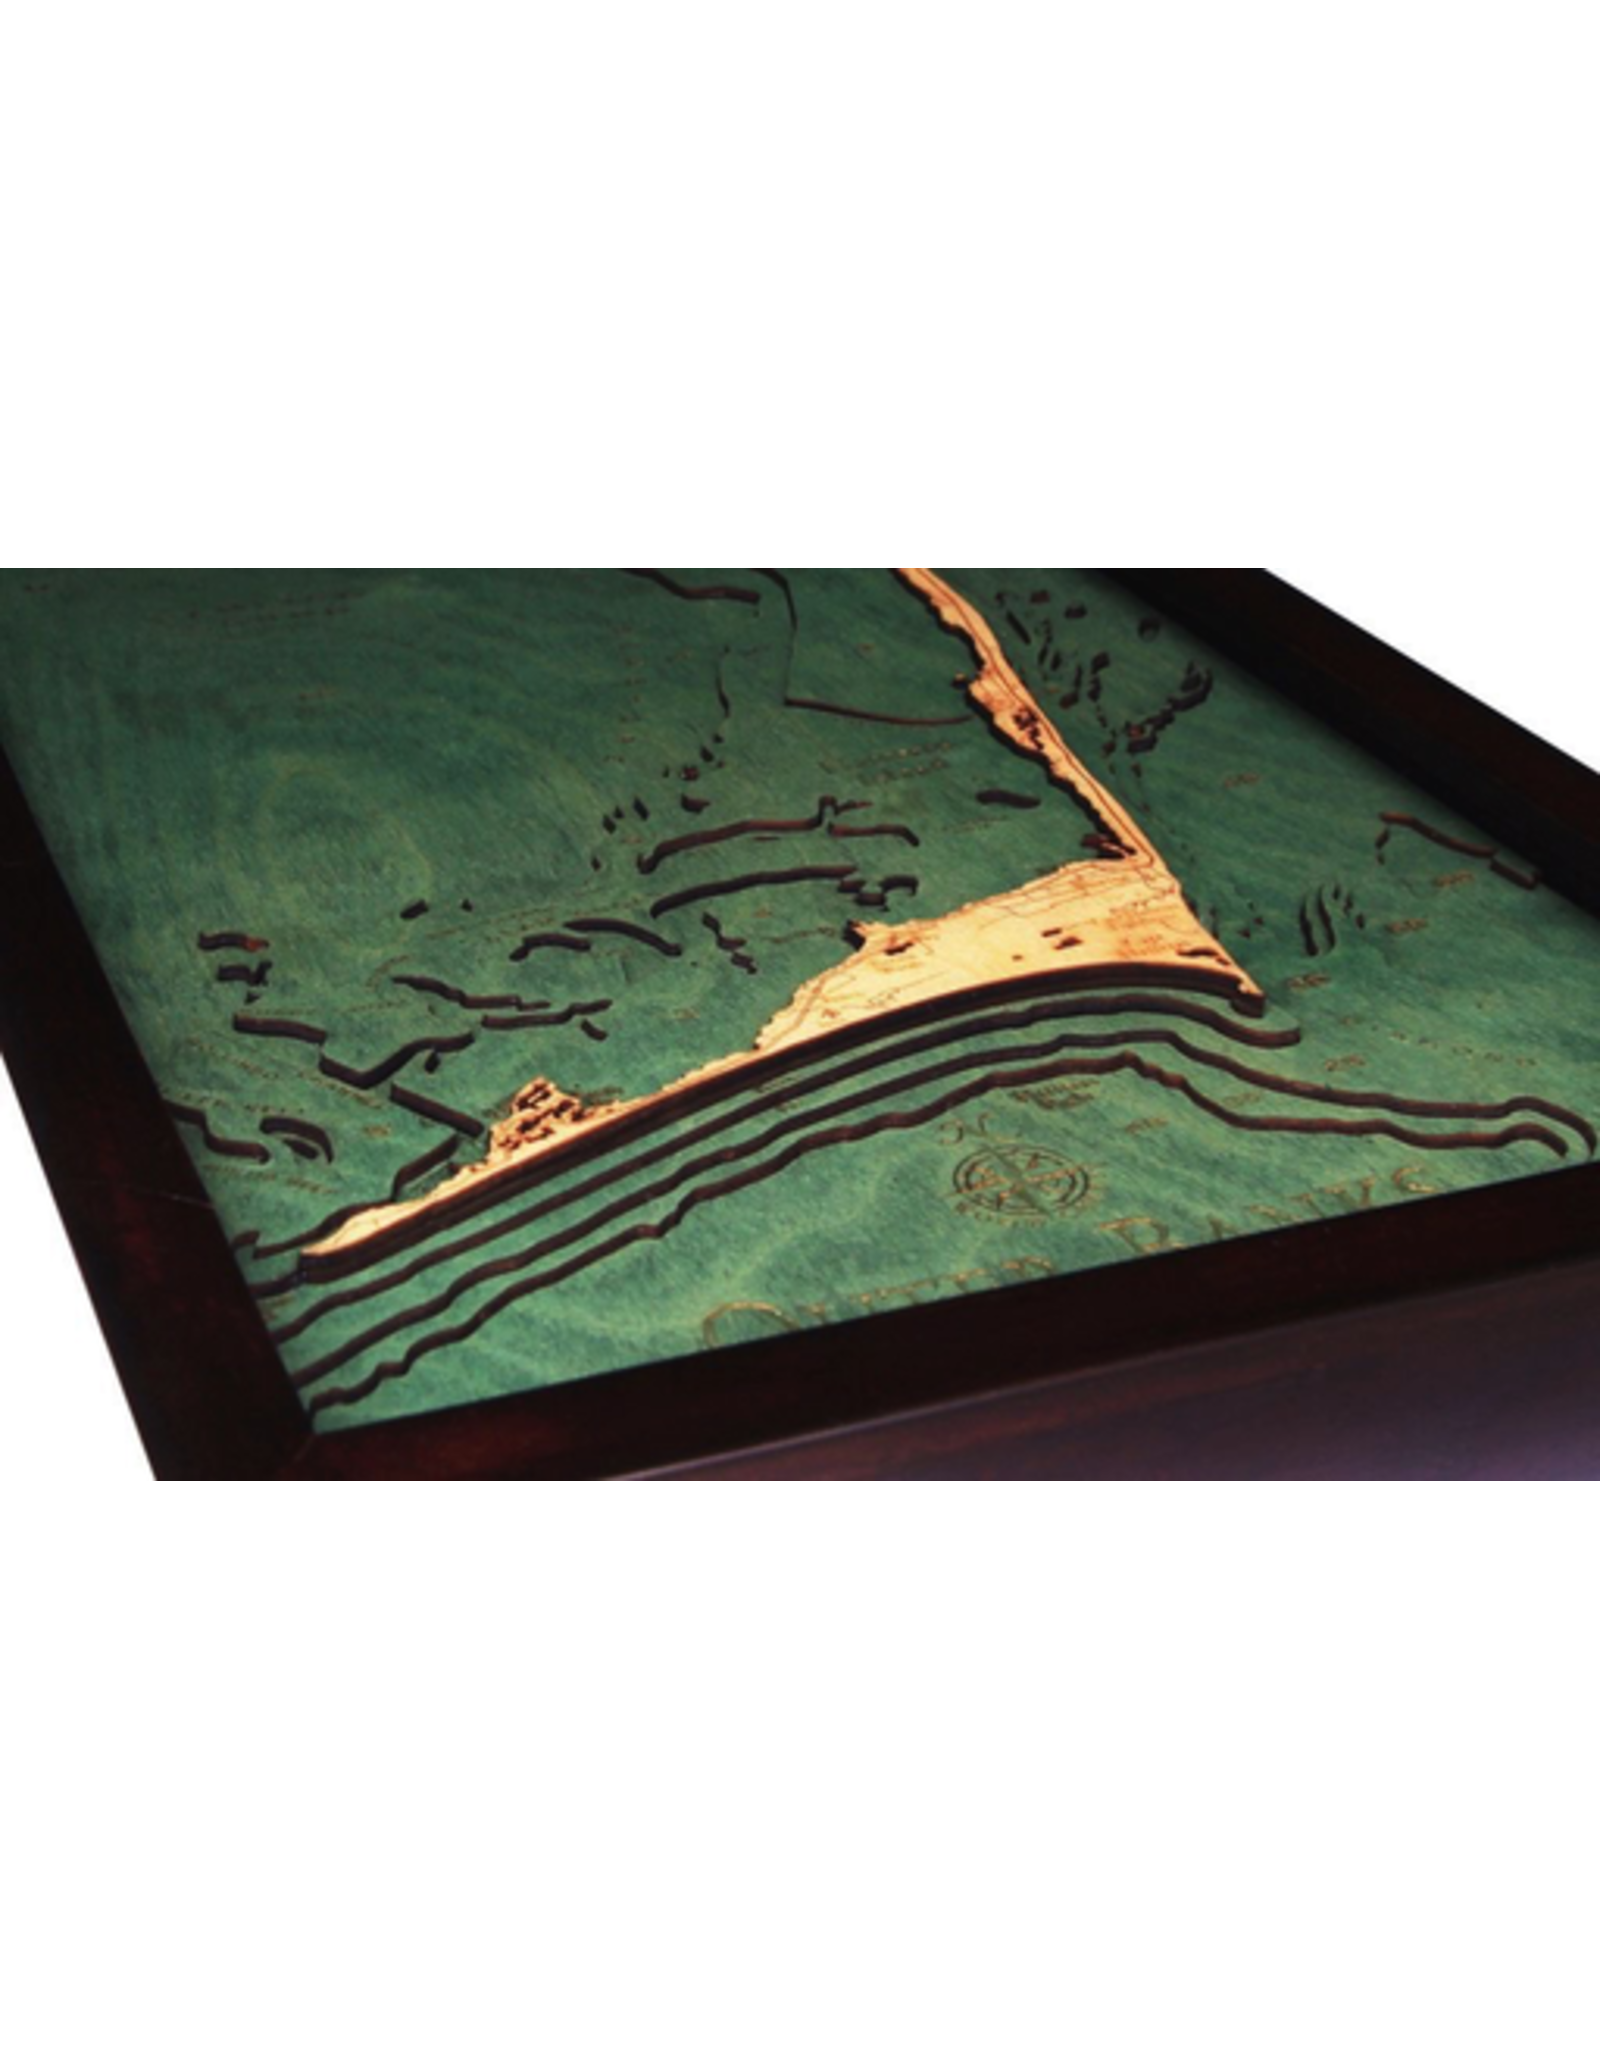 WoodCharts Outer Banks, NC (Bathymetric 3-D Nautical WOODCHART)